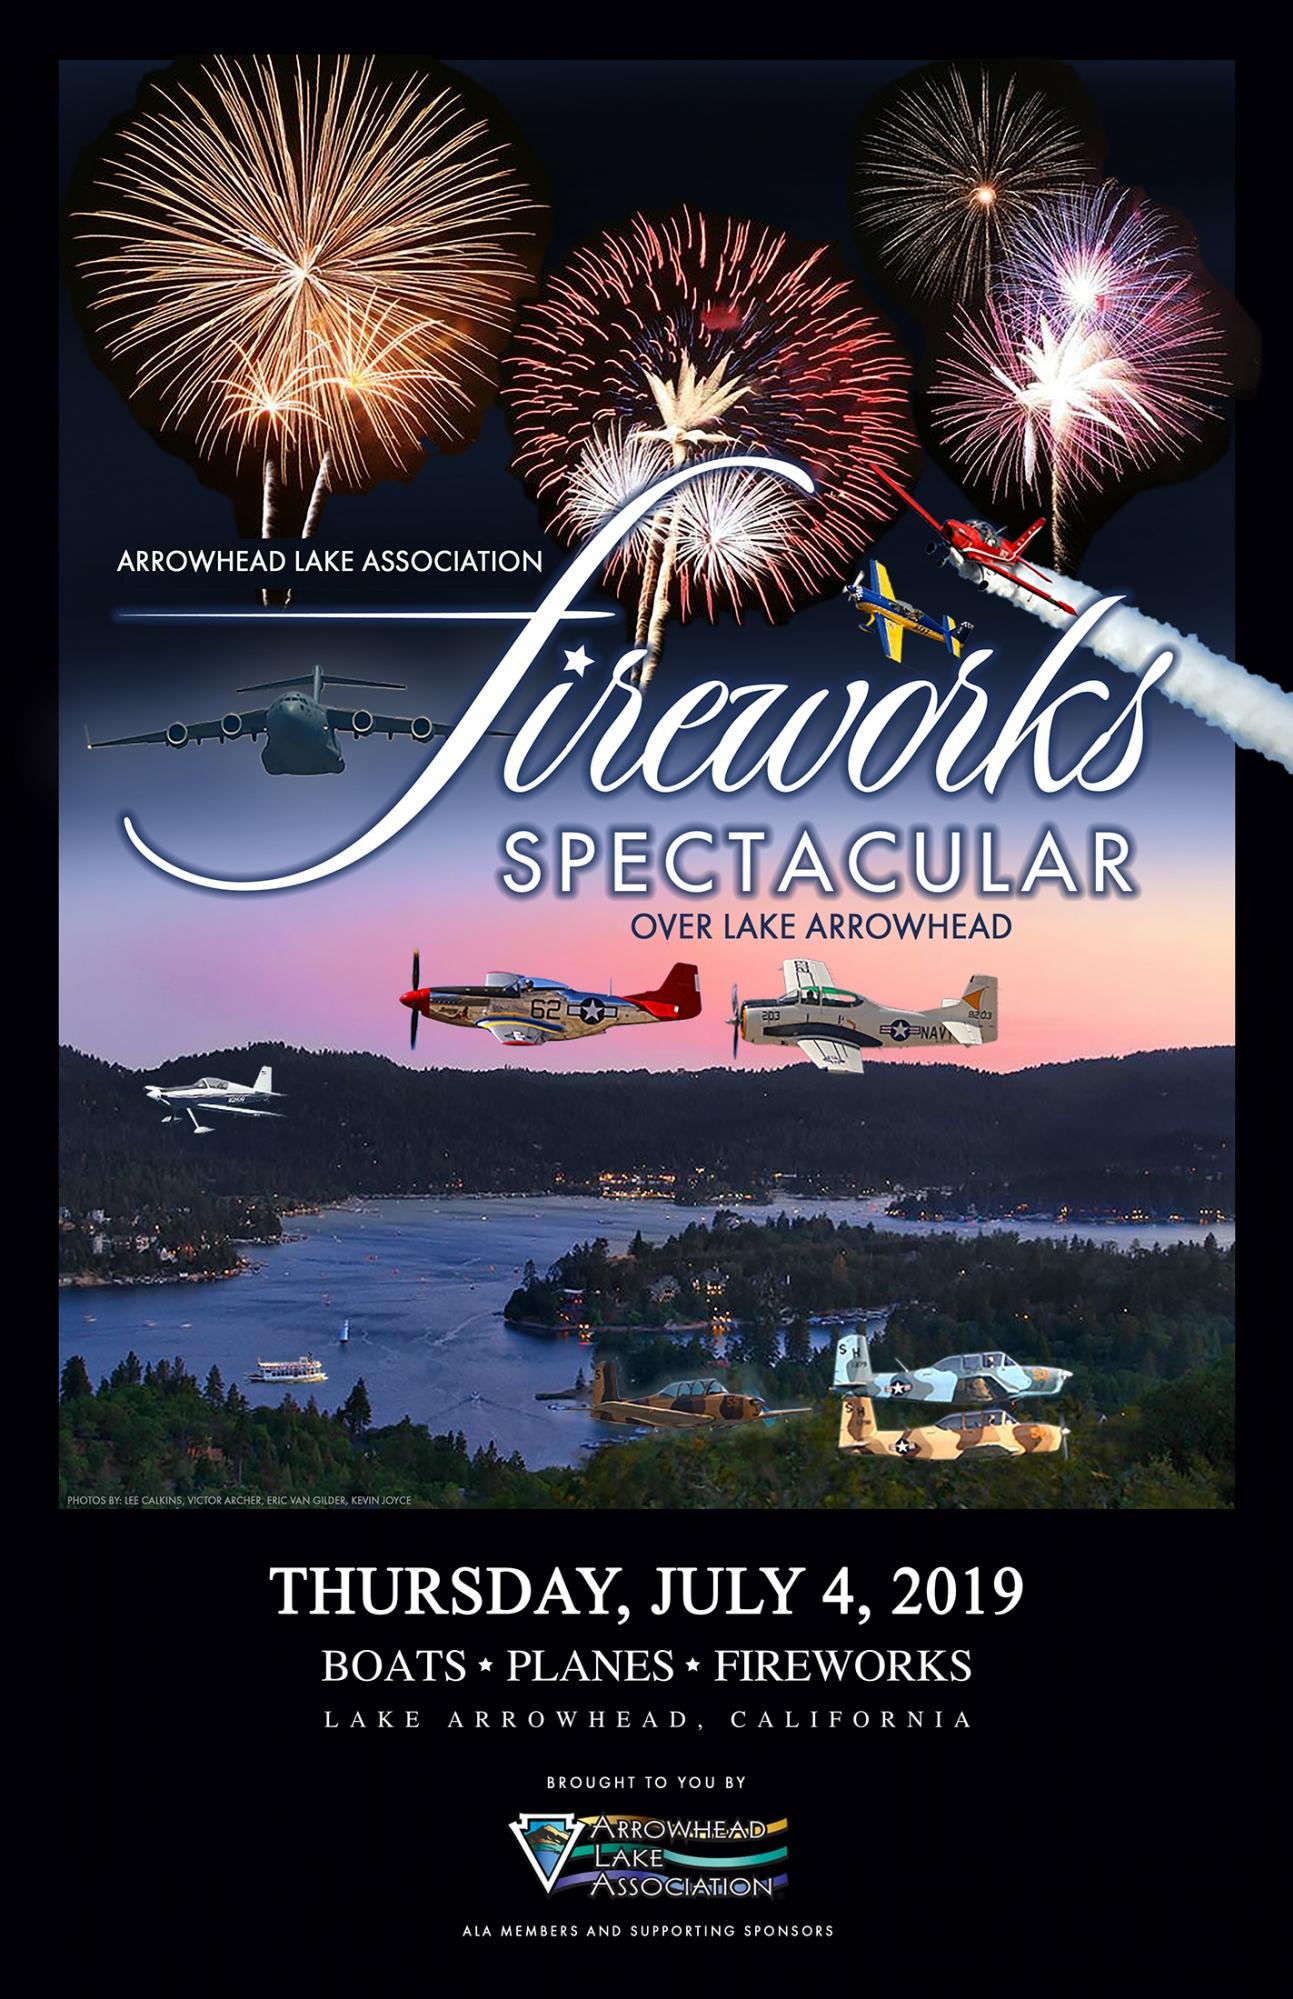 Fireworks Spectacular - Arrowhead Lake Association